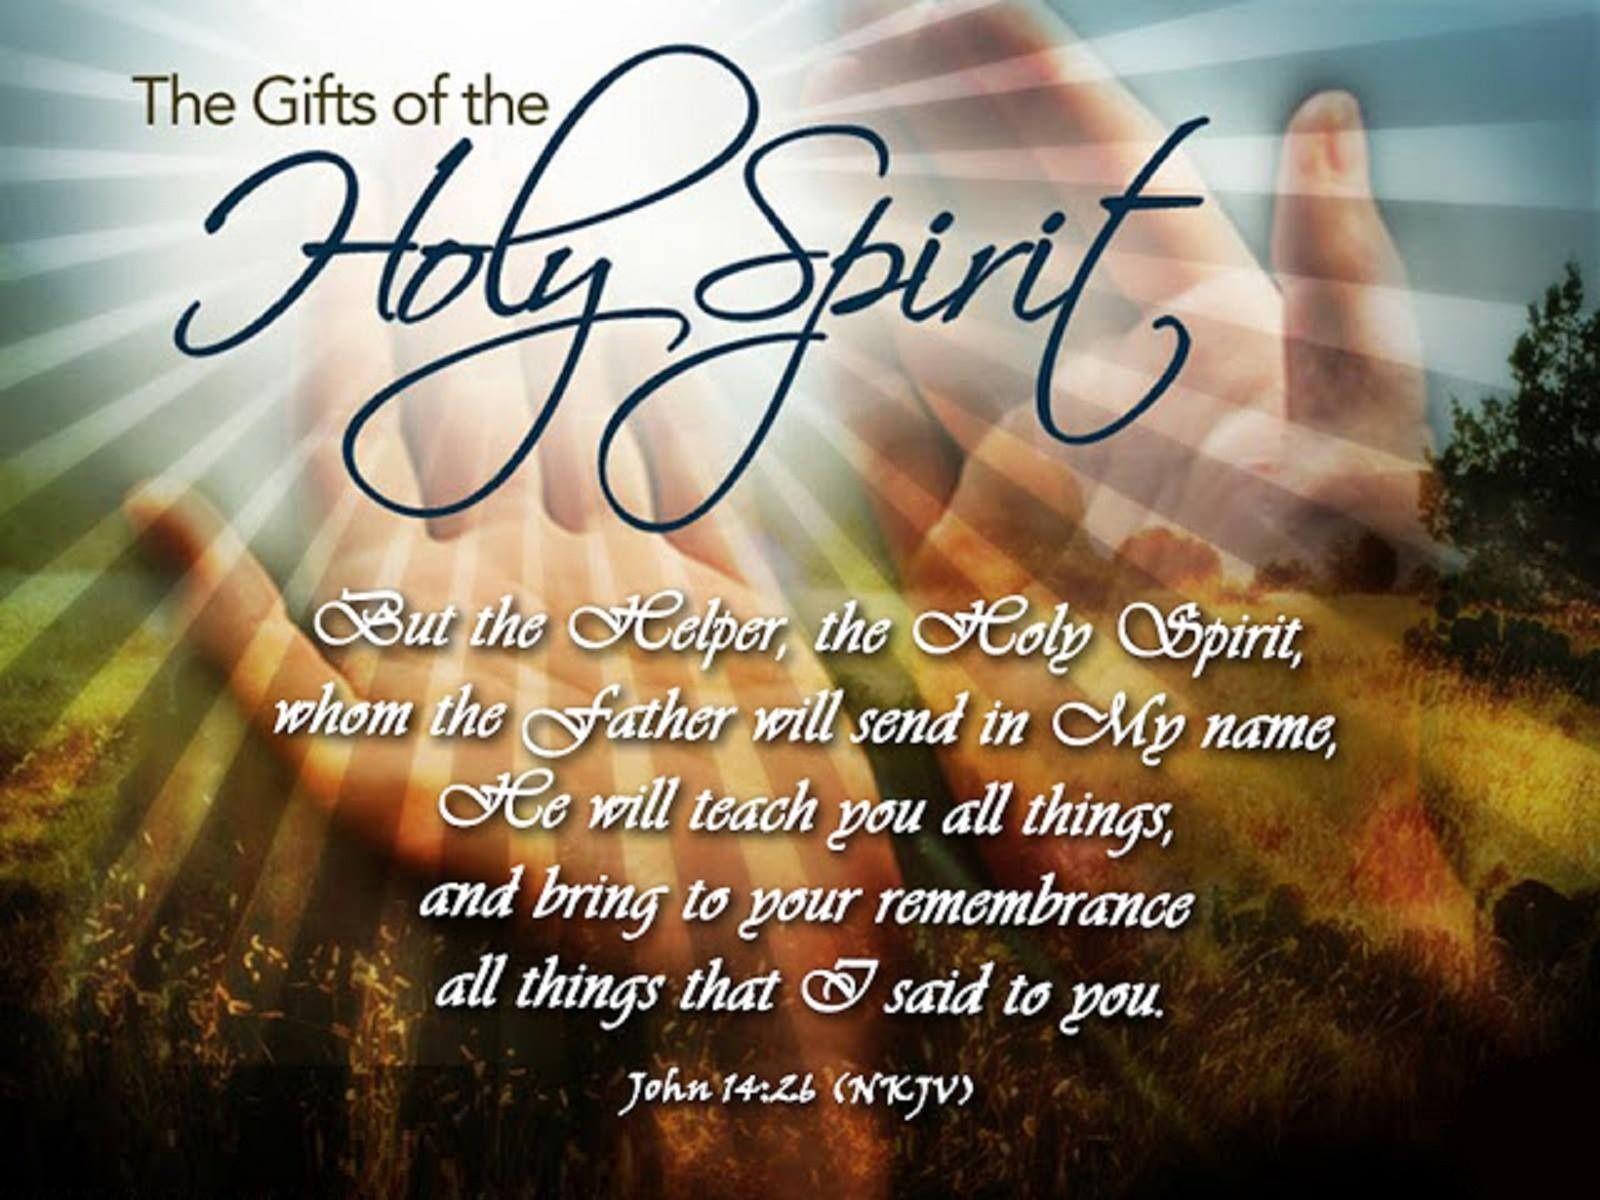 gifts of the holy spirit bible verse kjv